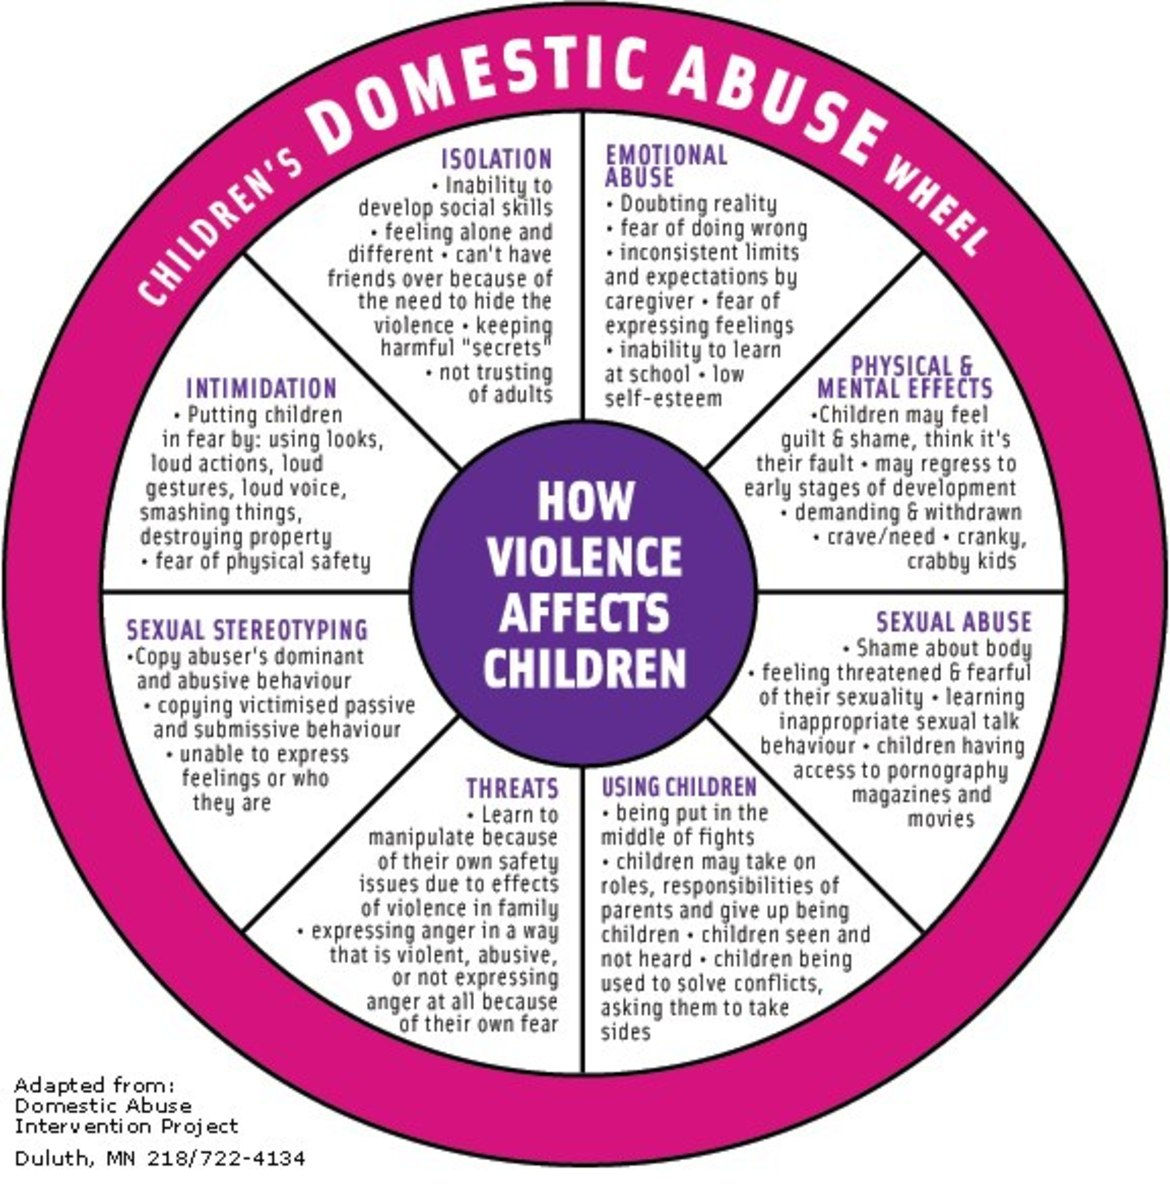 Children Victims Of Domestic Violence